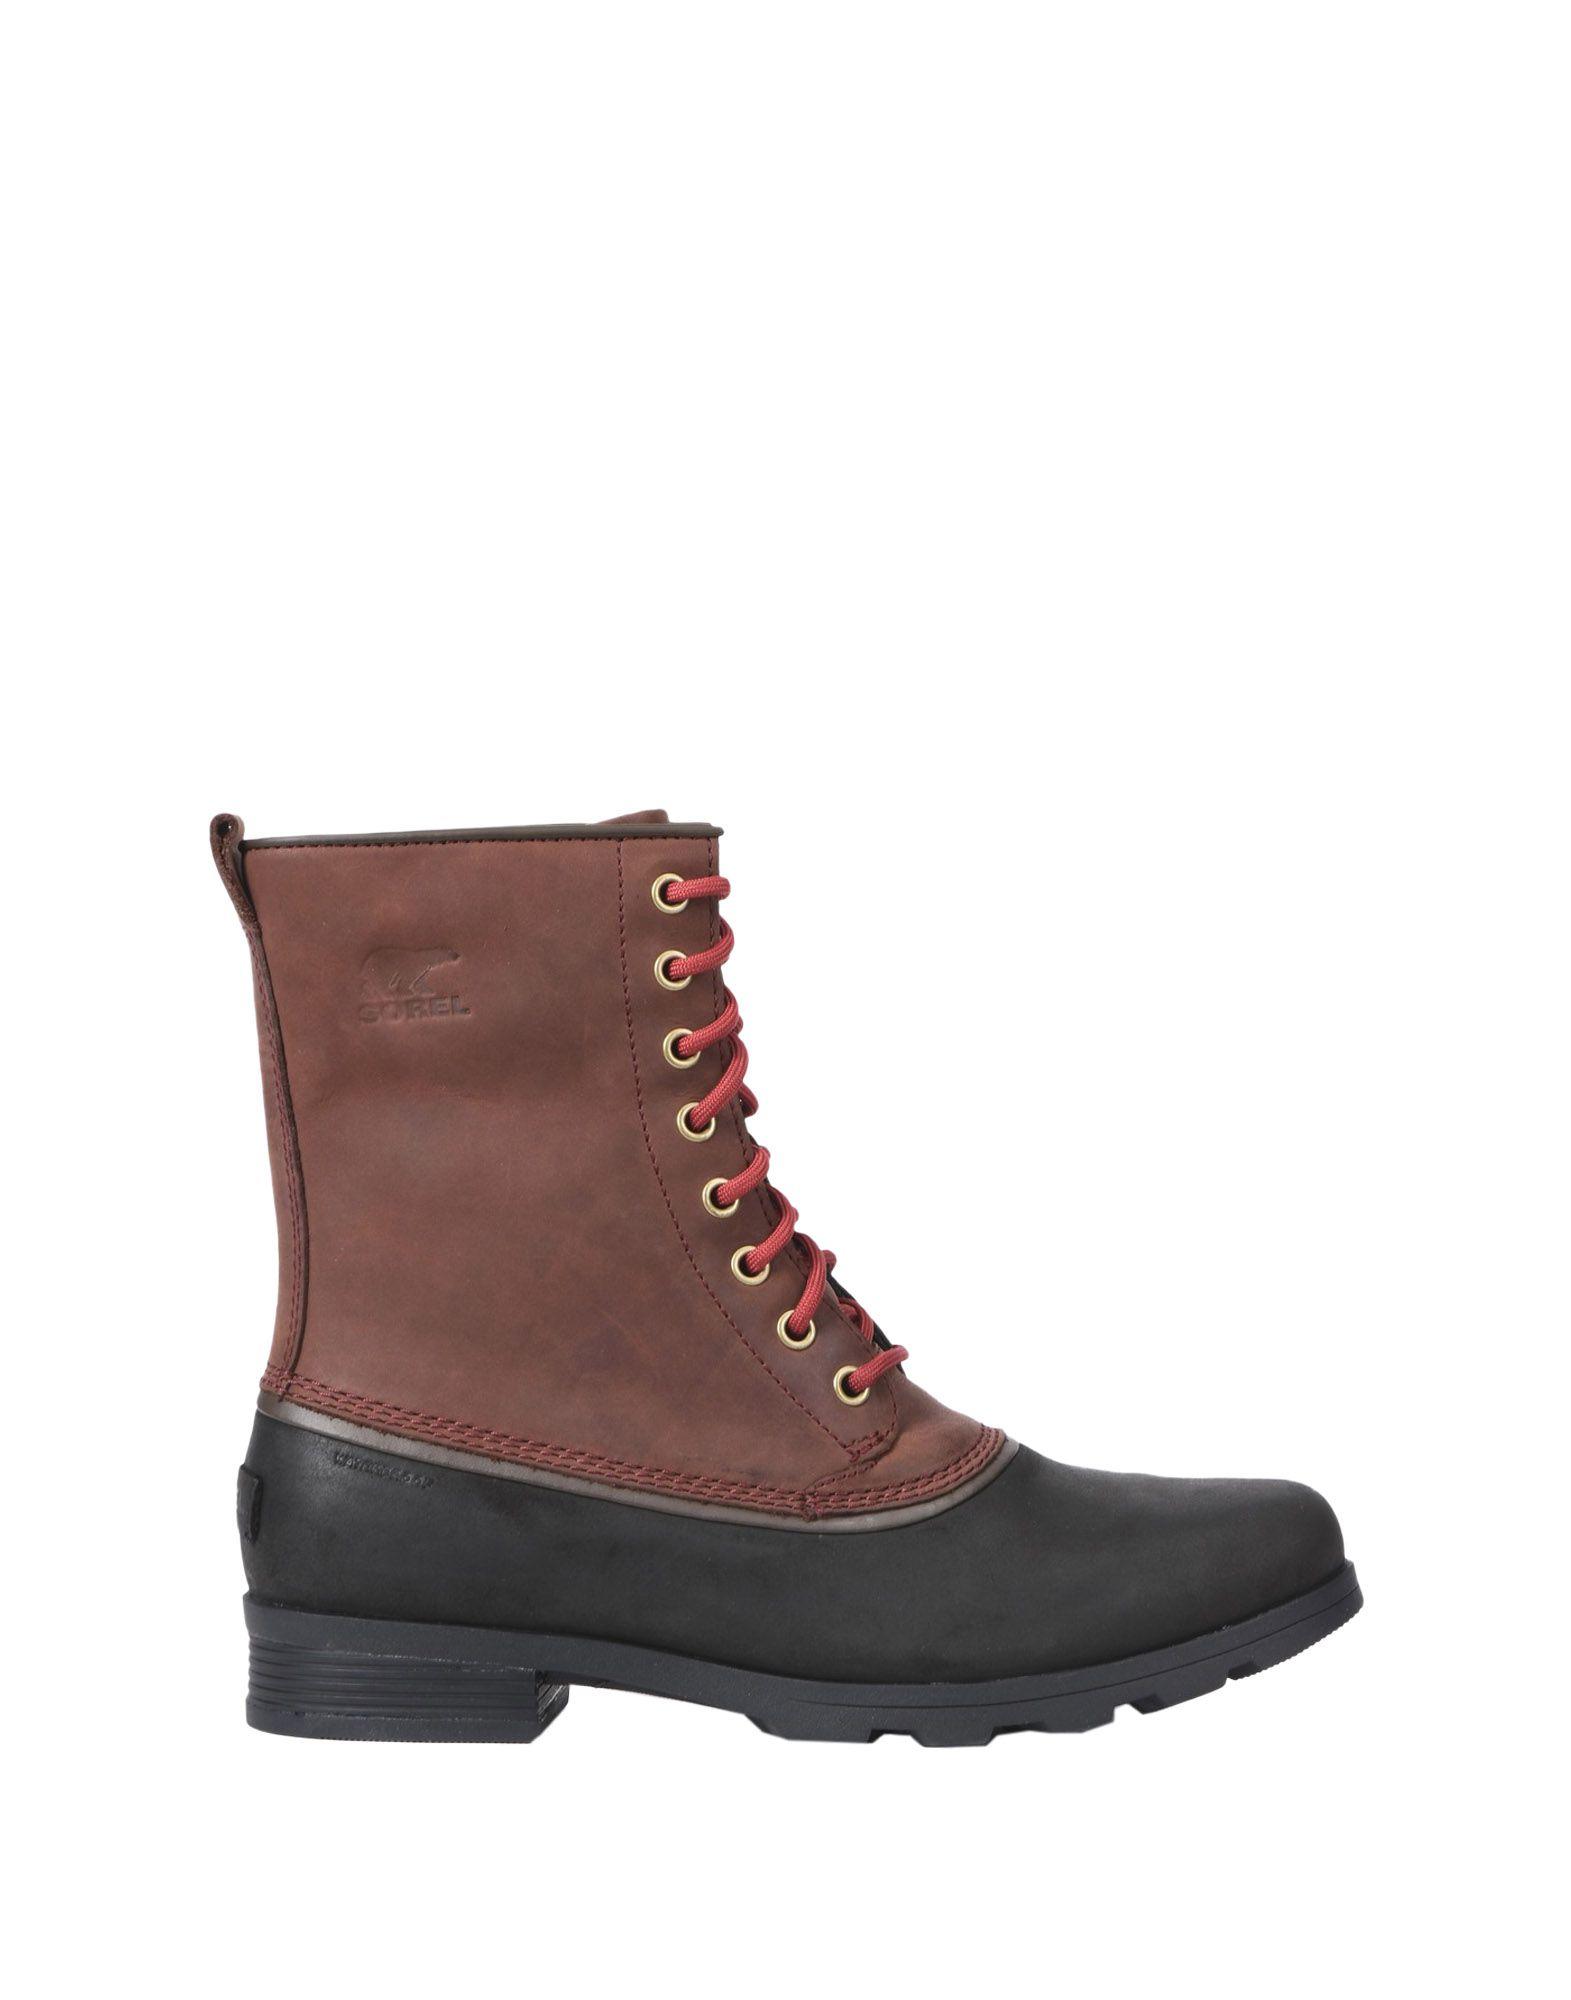 4890cdd82786 ... Gut tragenSorel um billige Schuhe zu tragenSorel Gut Emelie 1964  11328131VM b4fbc7 ...